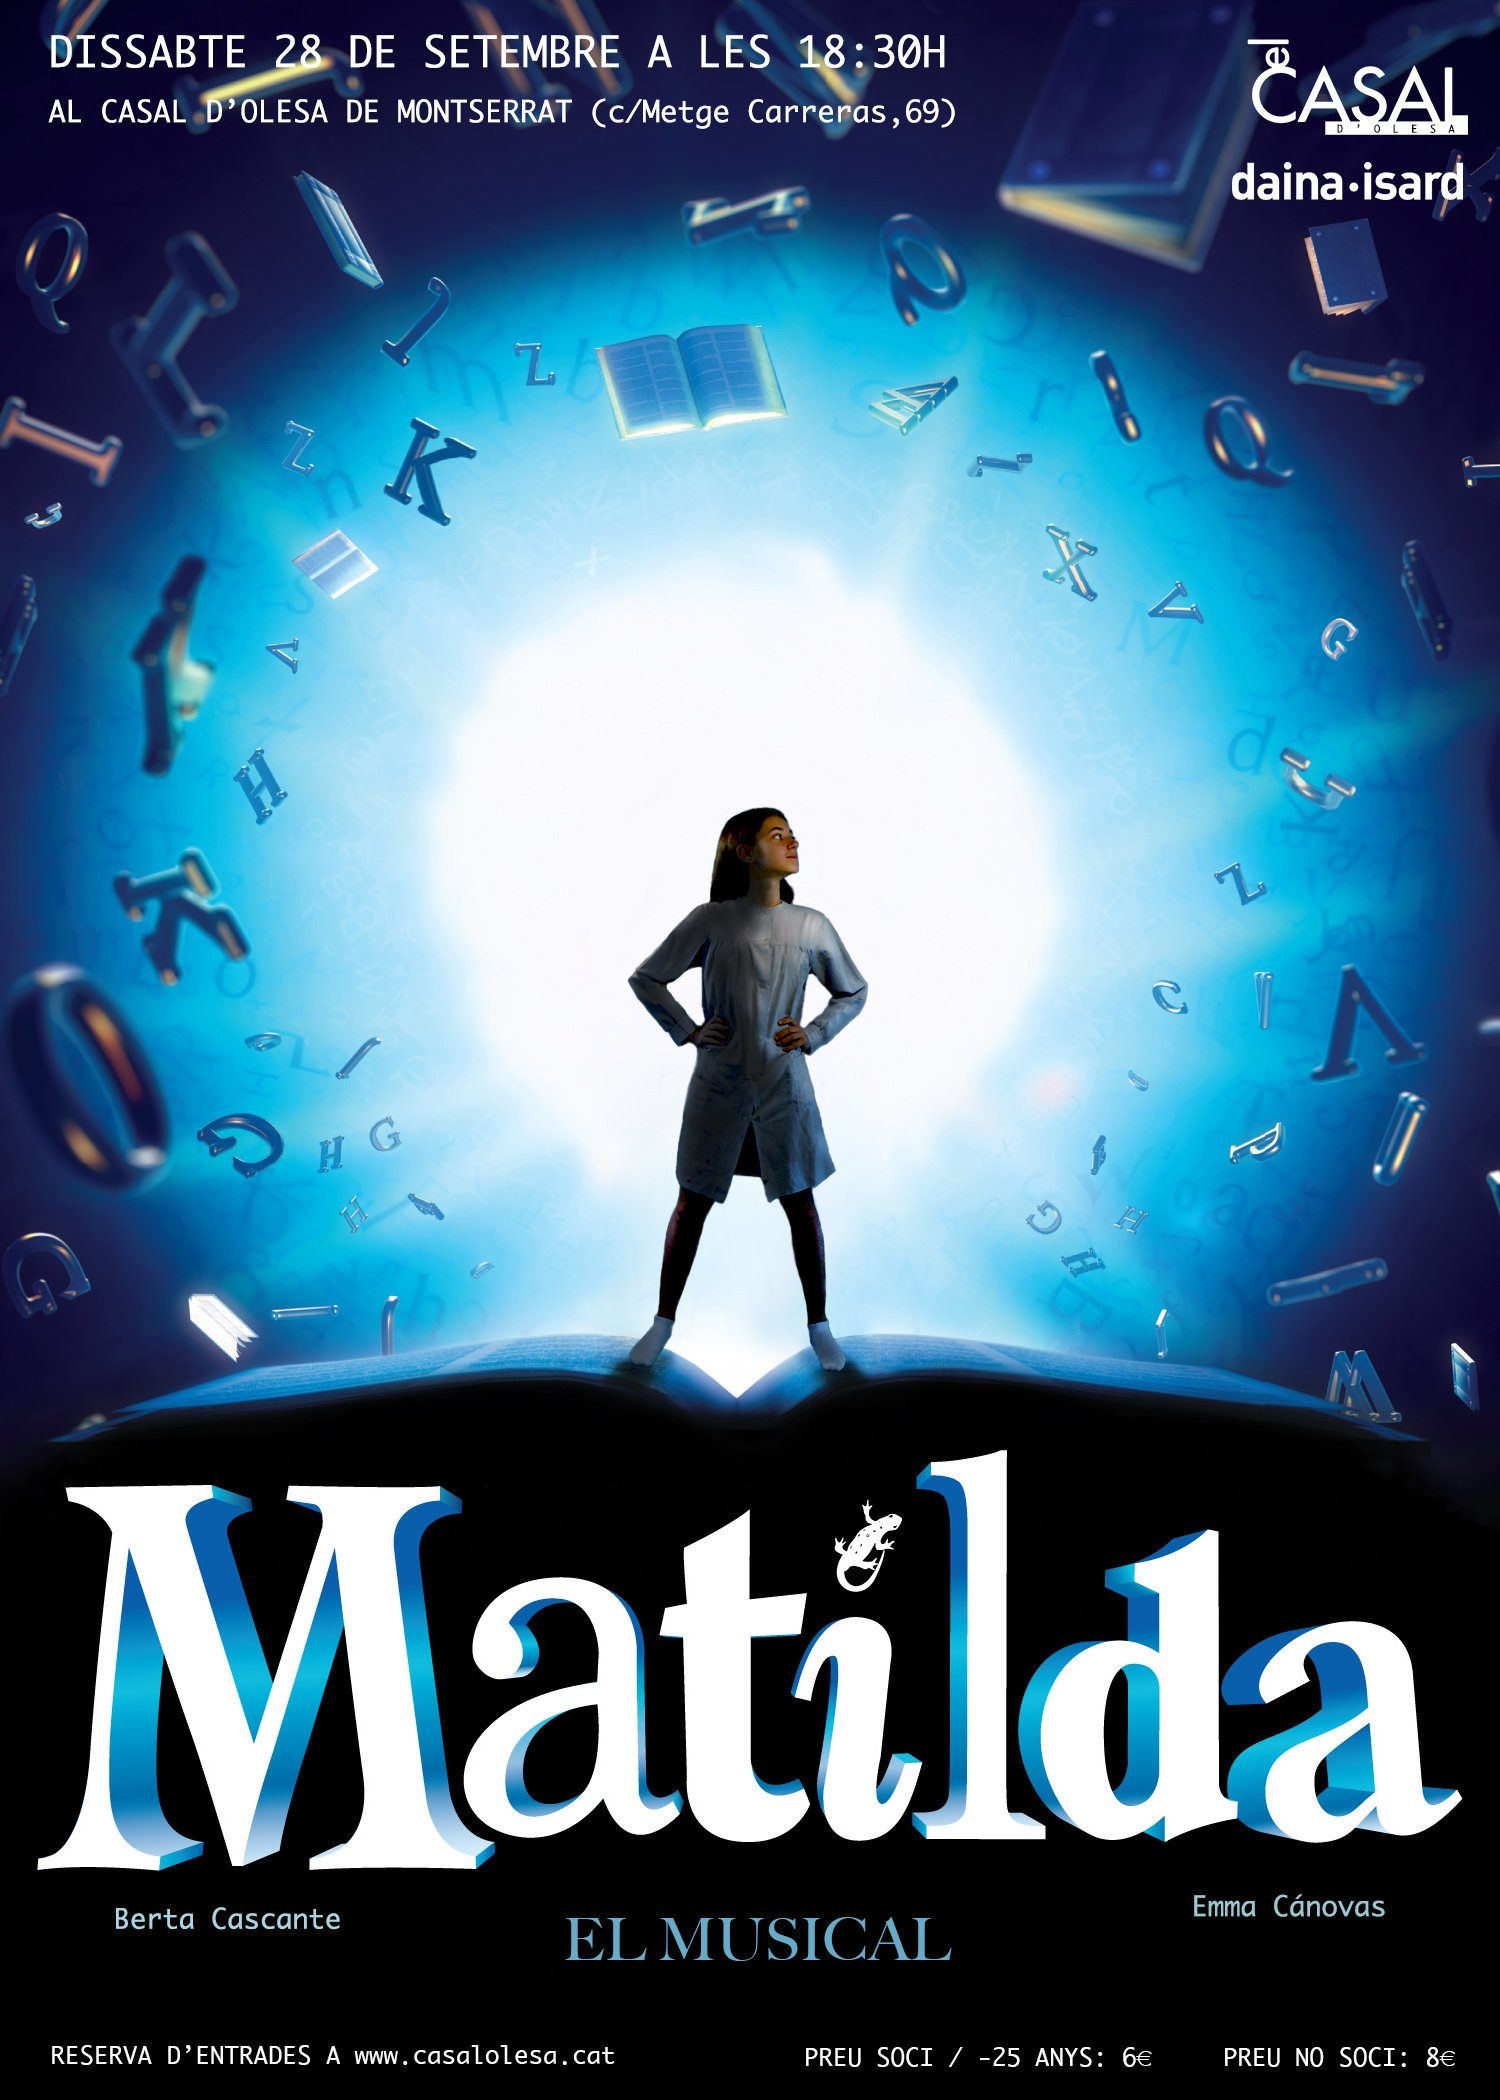 Matilda, el musical